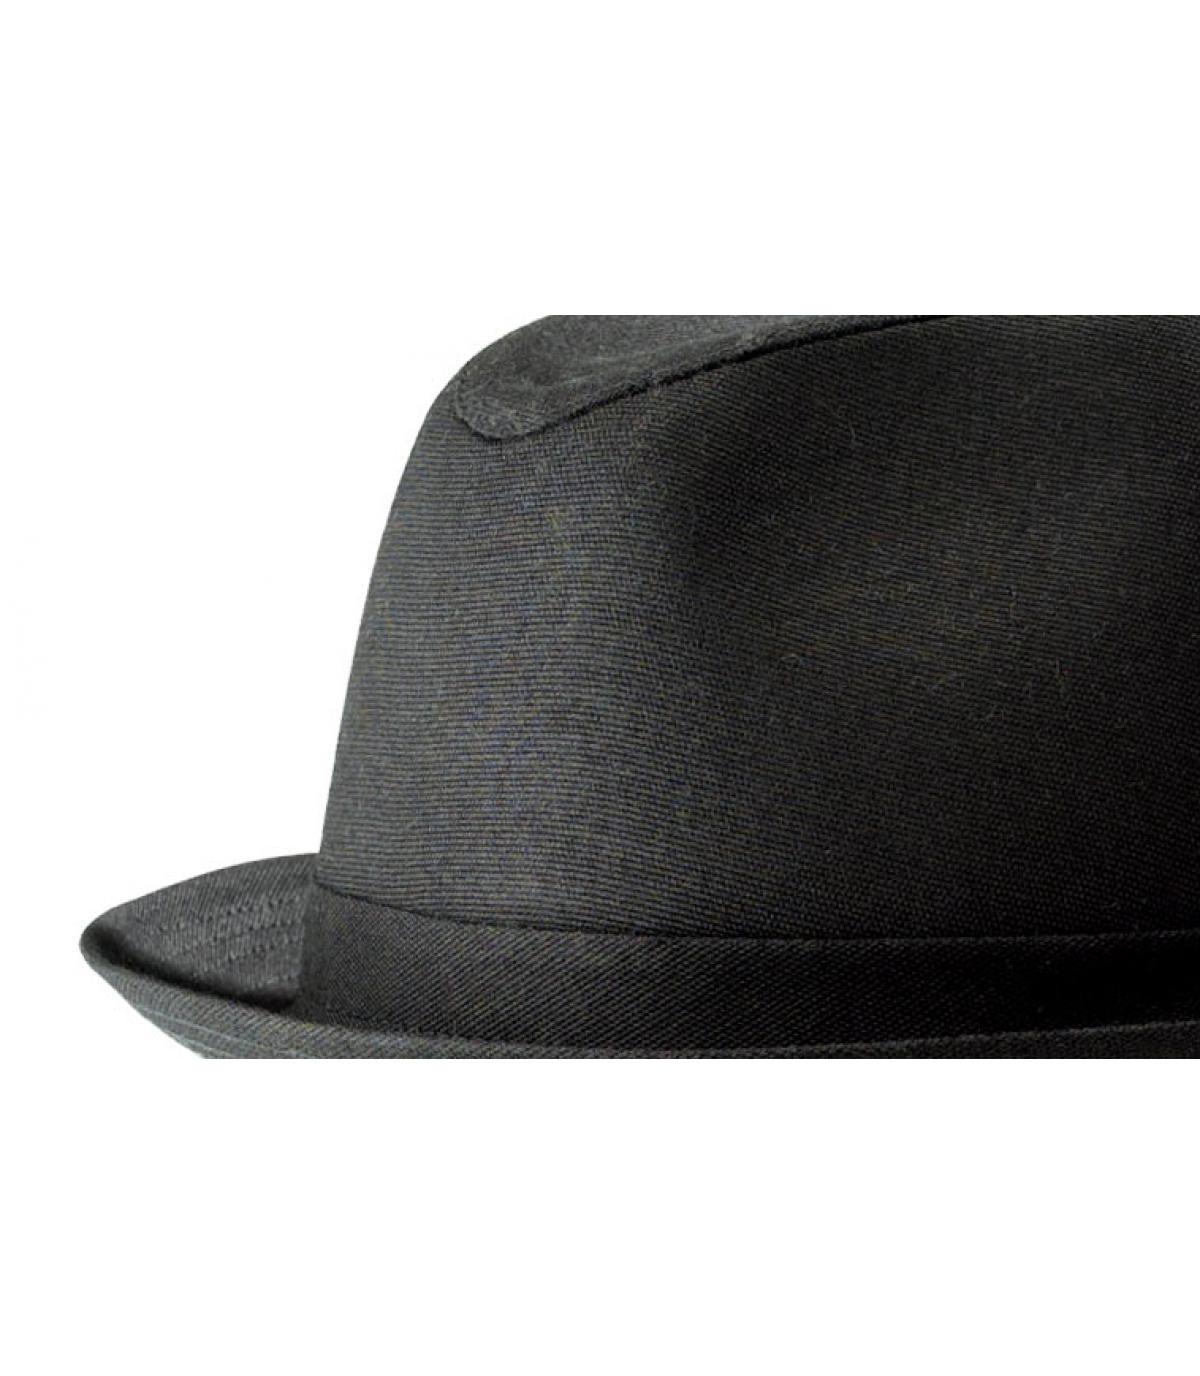 abaa065db0e73 Sombrero hombre Stetson - Kane black Stetson imagen 1 ...